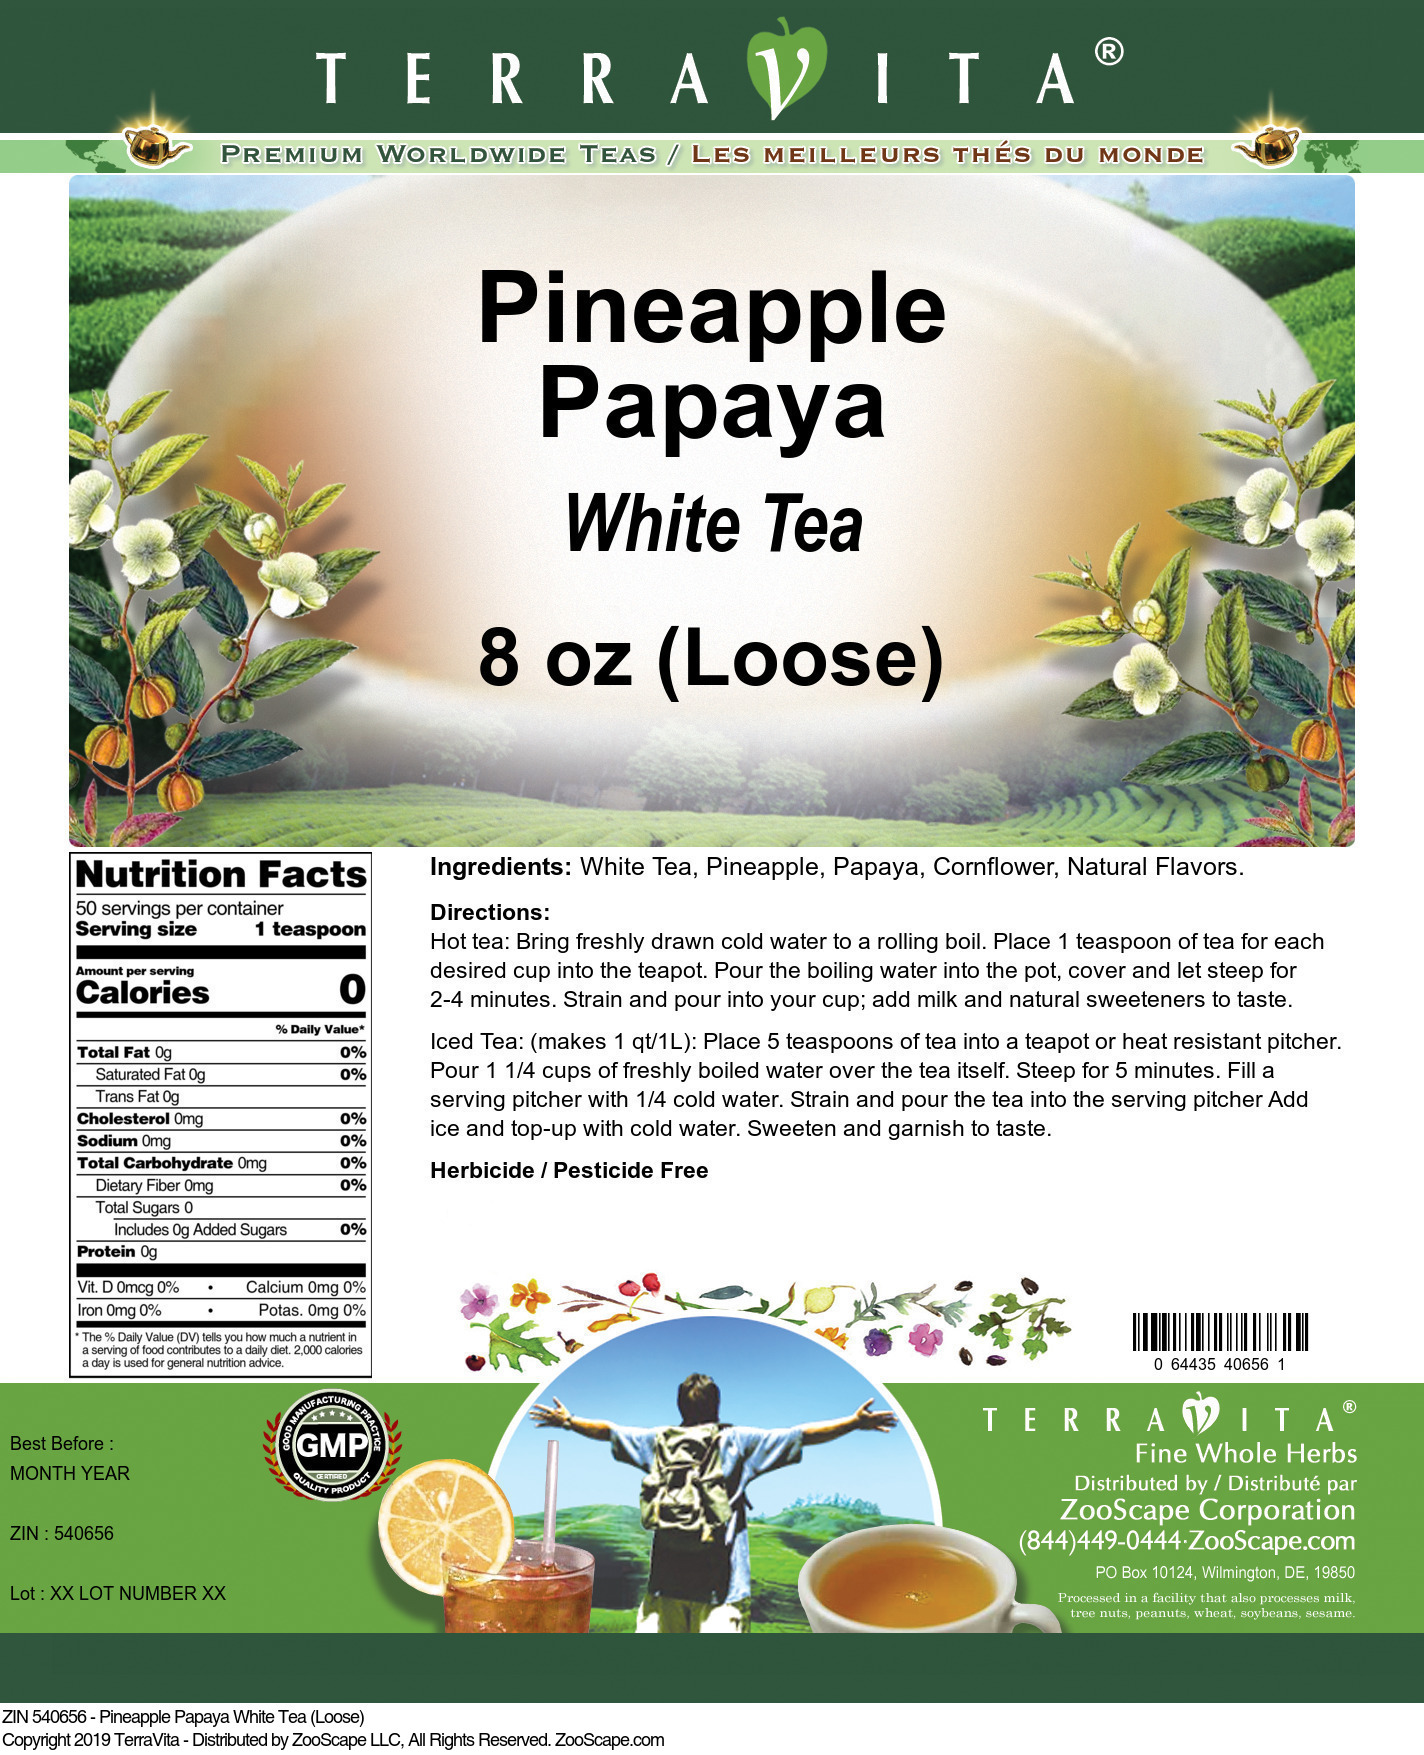 Pineapple Papaya White Tea